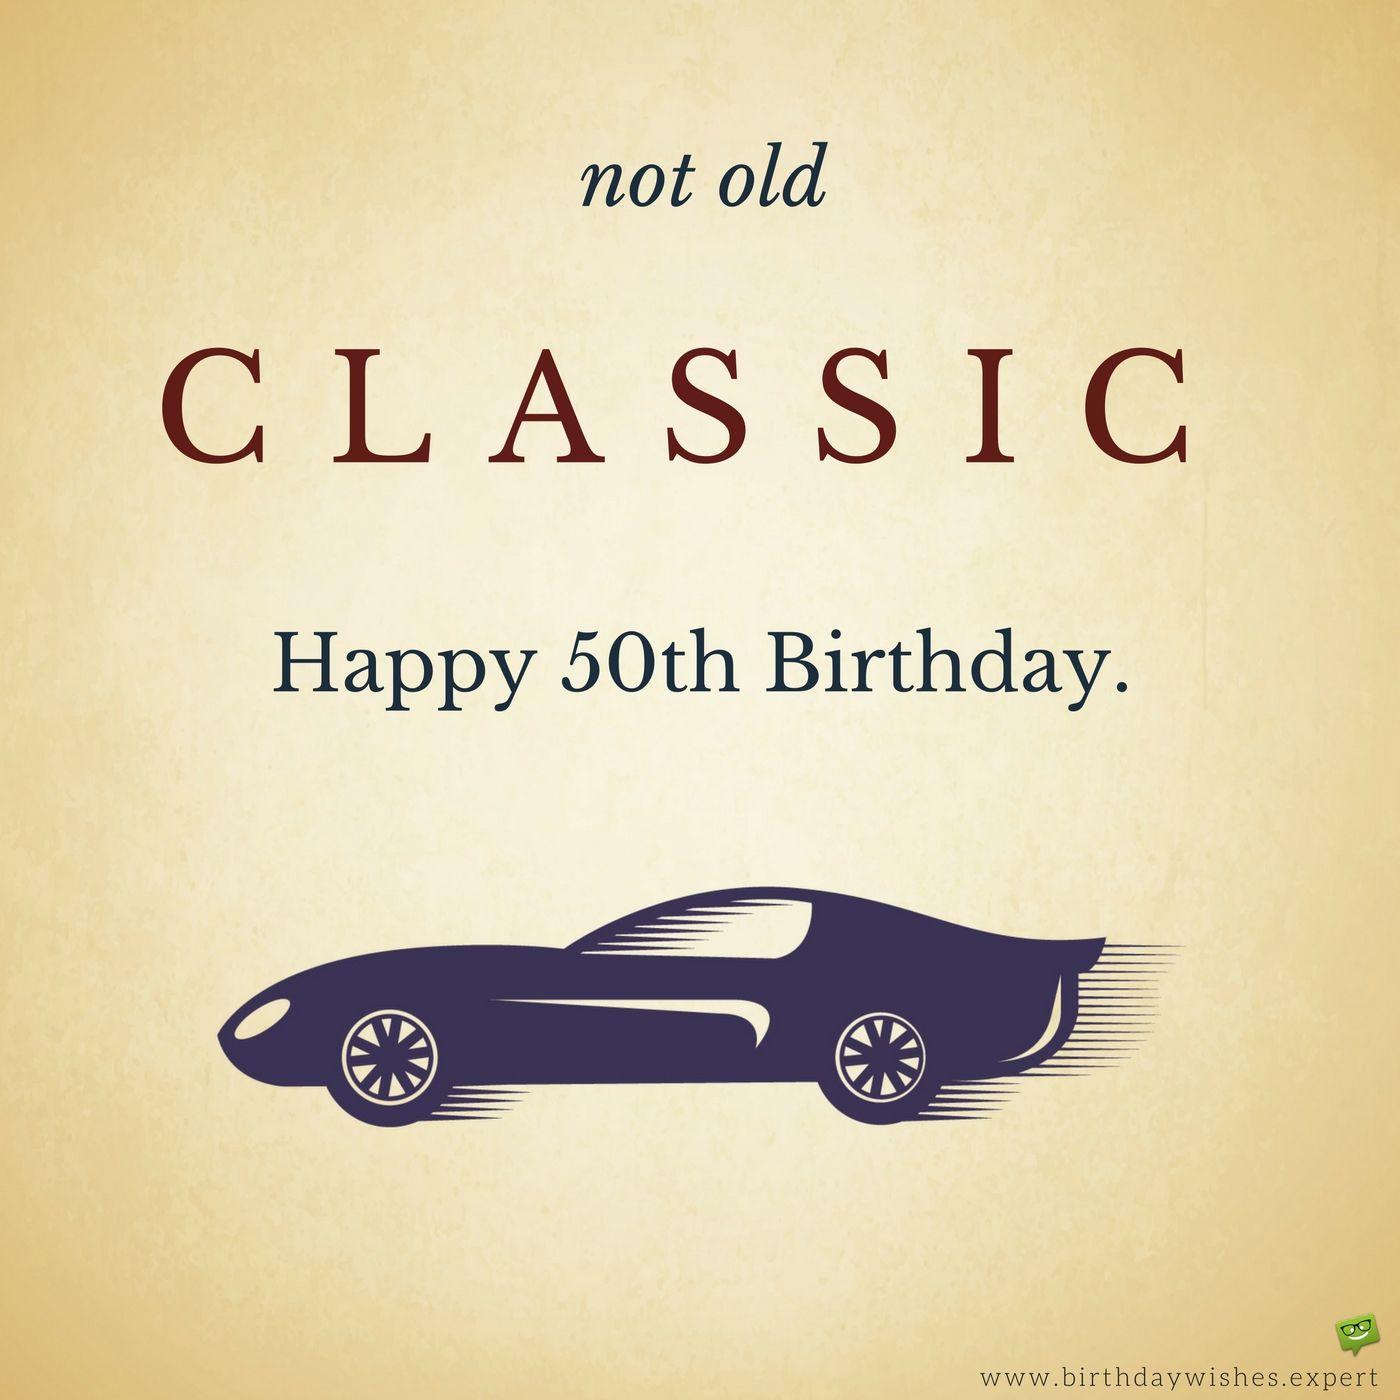 Happy 50th Birthday, 50th Birthday